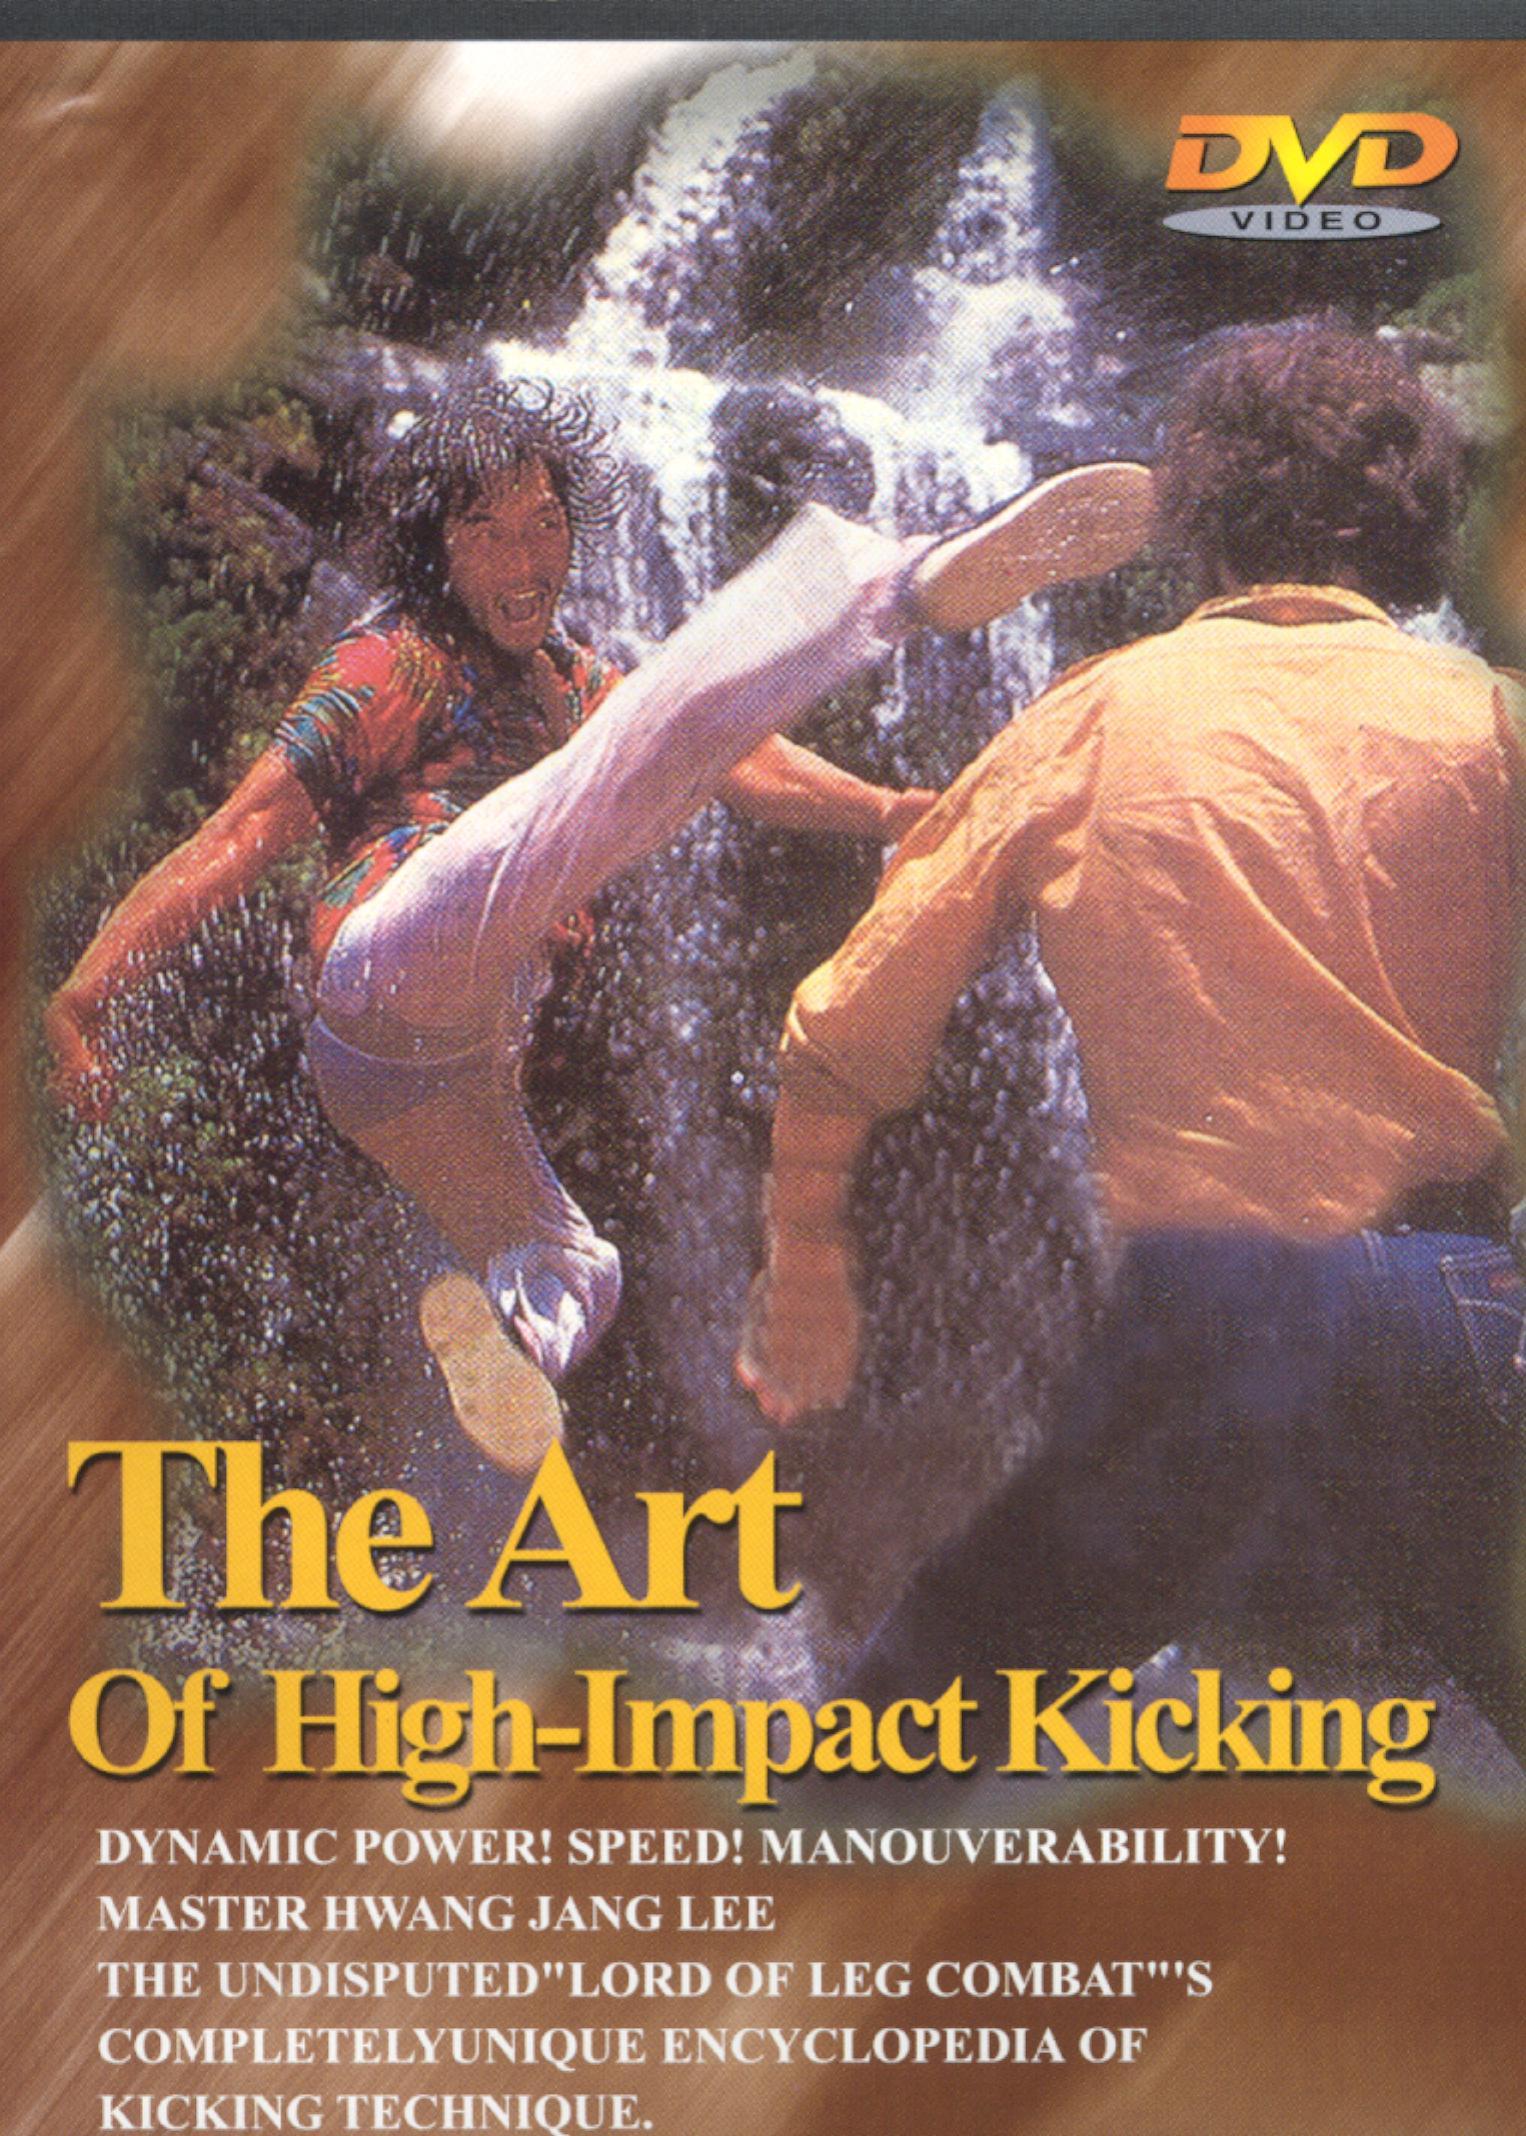 The Art of High Impact Kicking